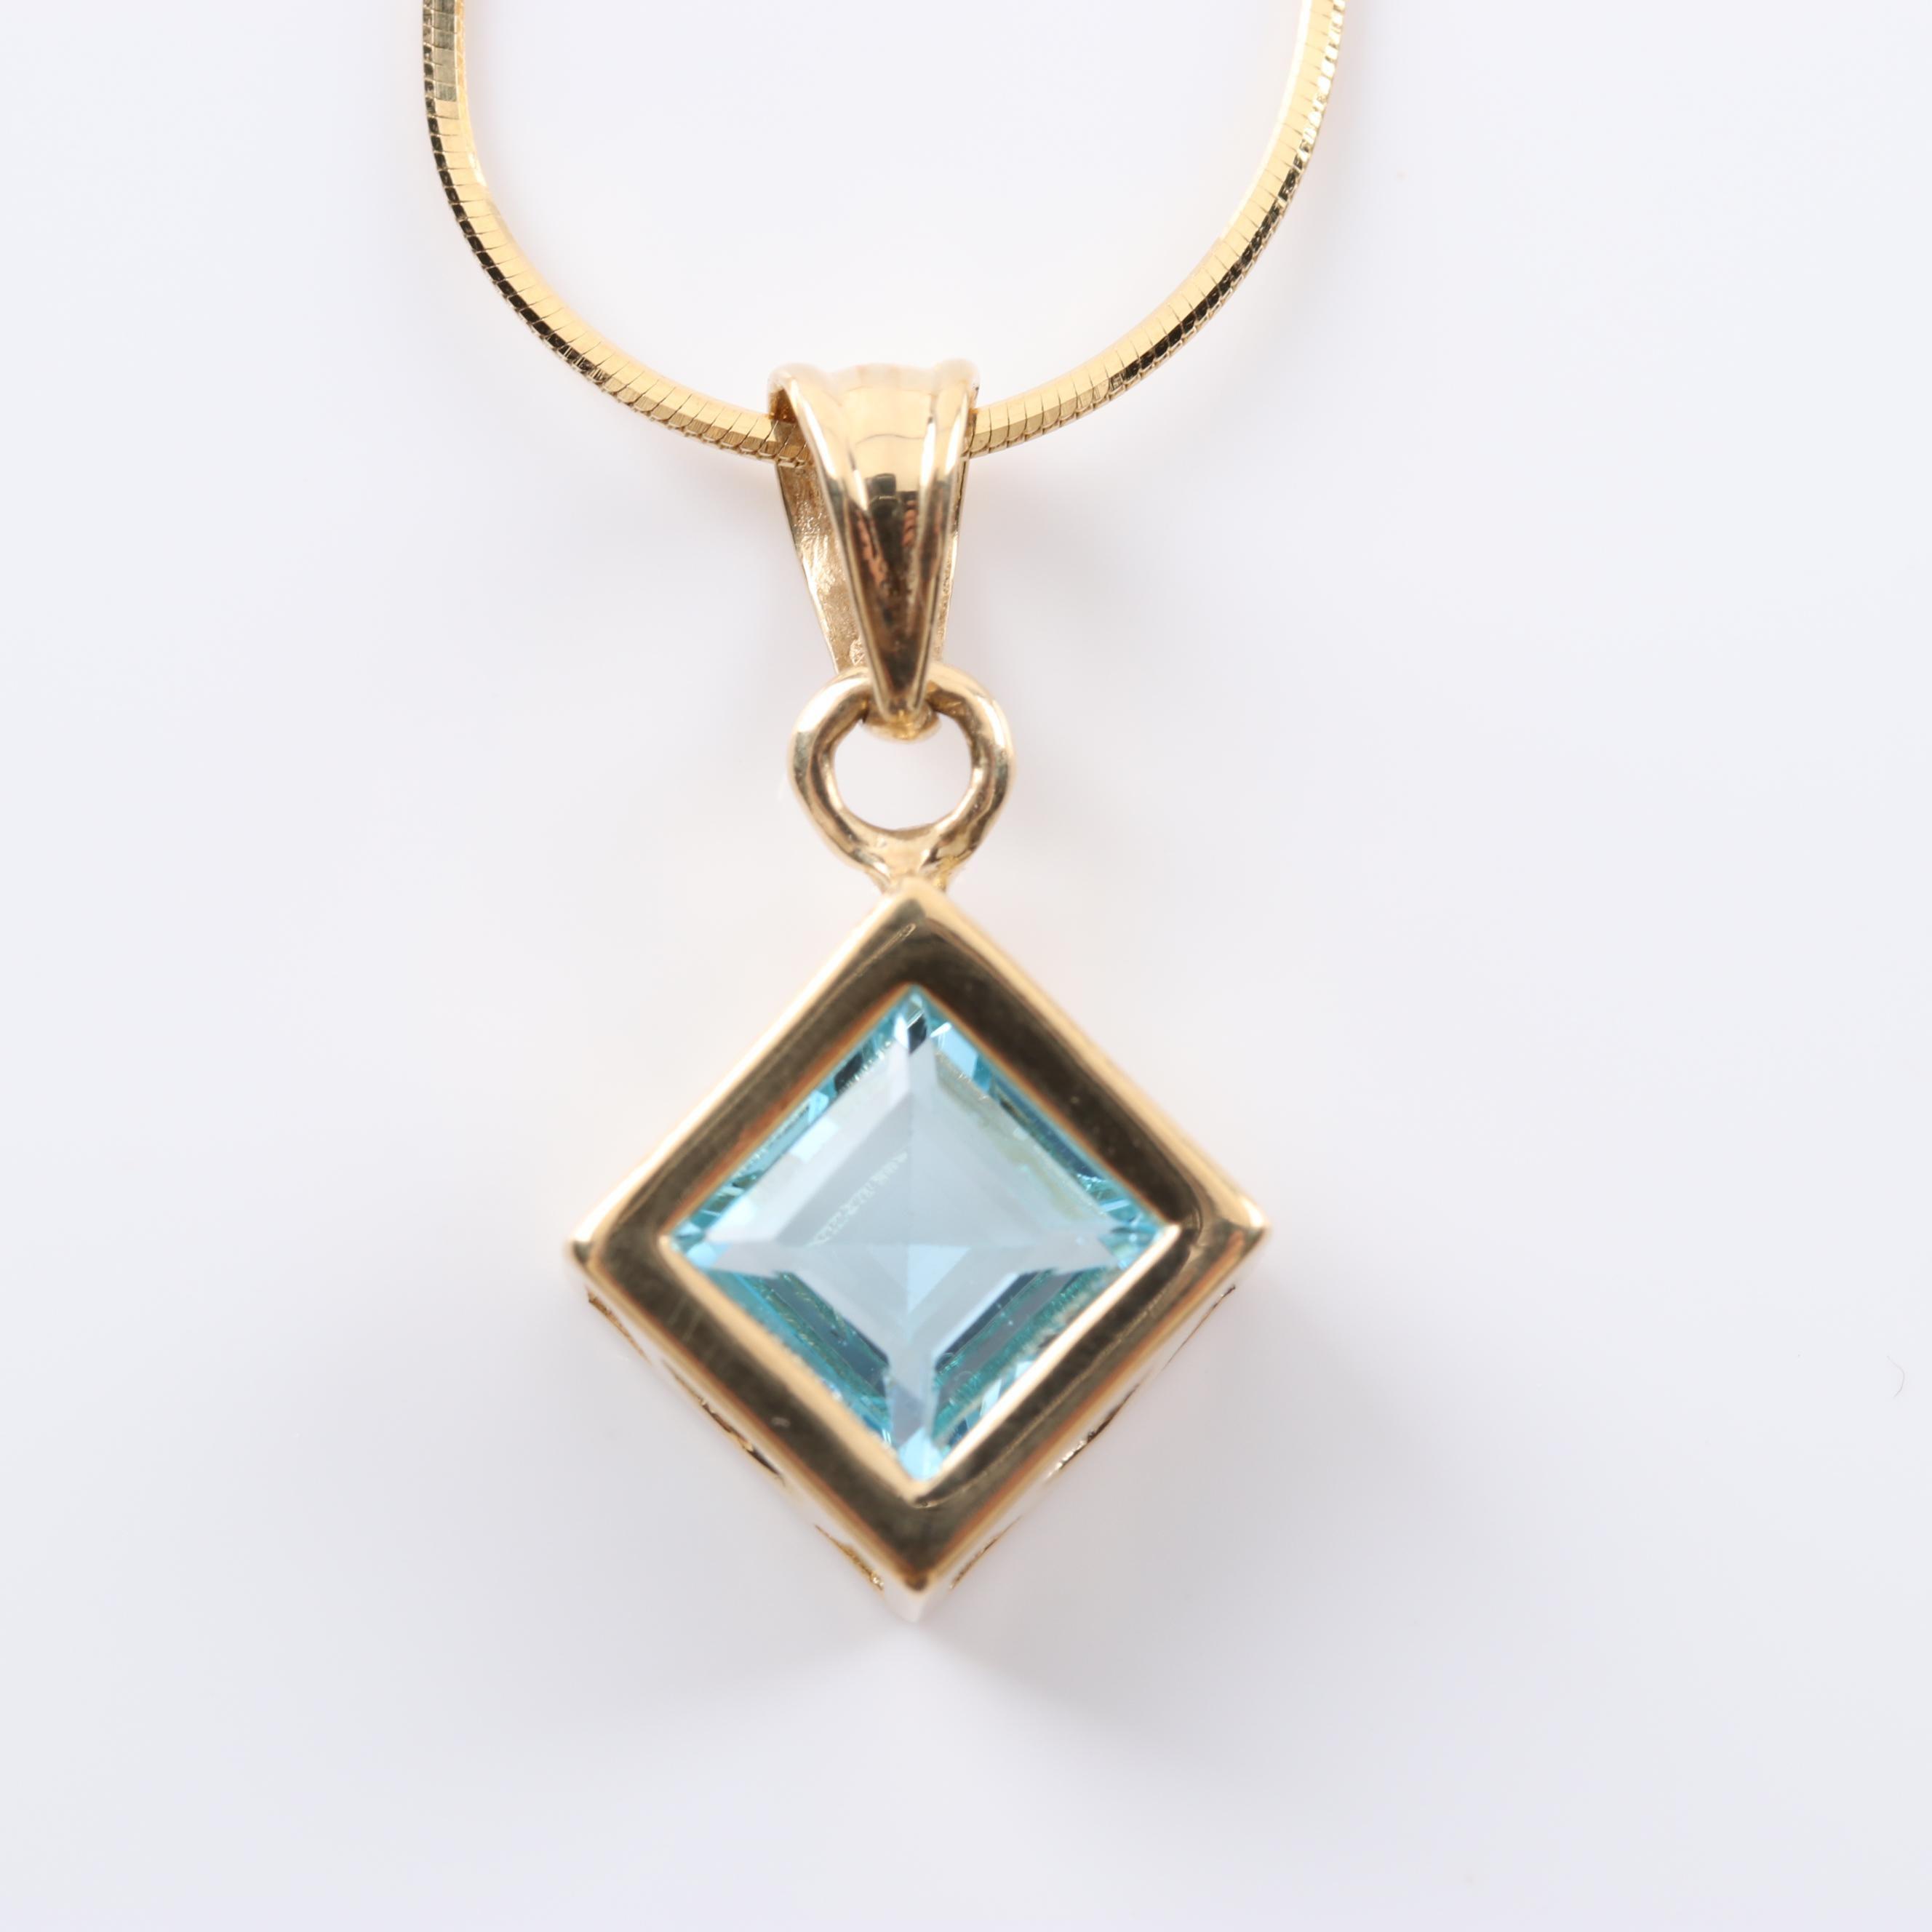 14K Yellow Gold Topaz Pendant Necklace